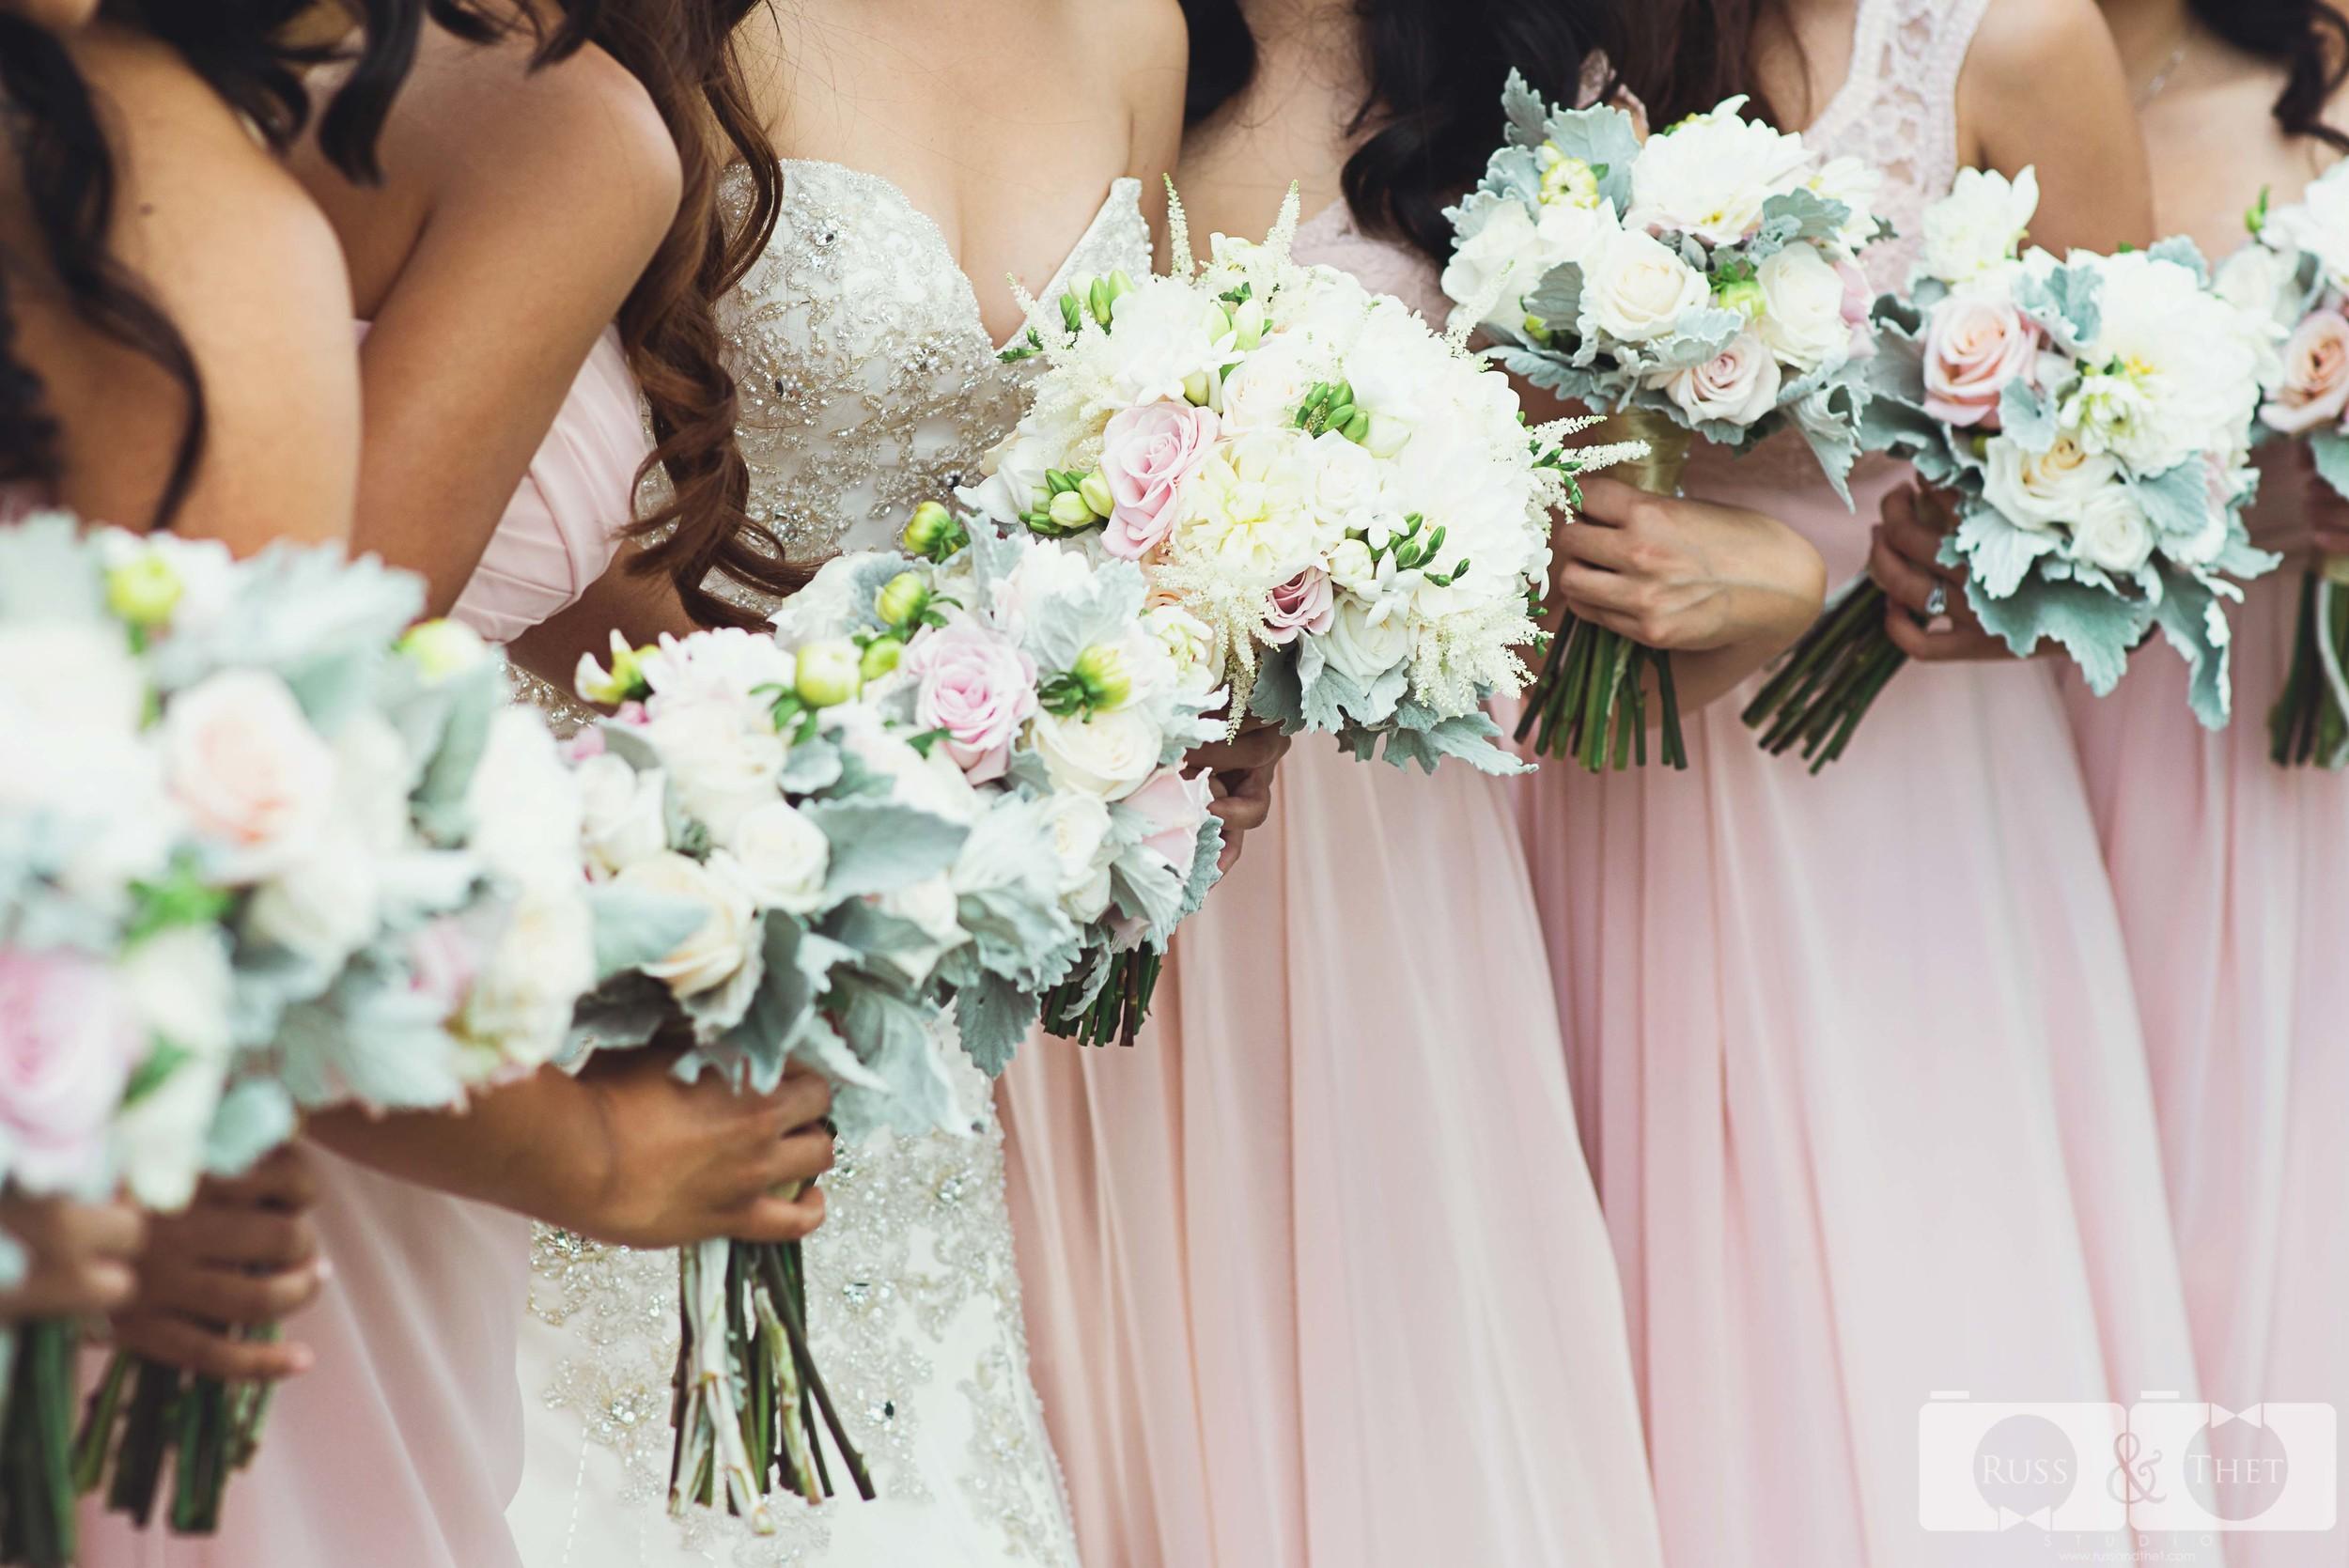 summit-house-fullerton-wedding-photographer-61.JPG